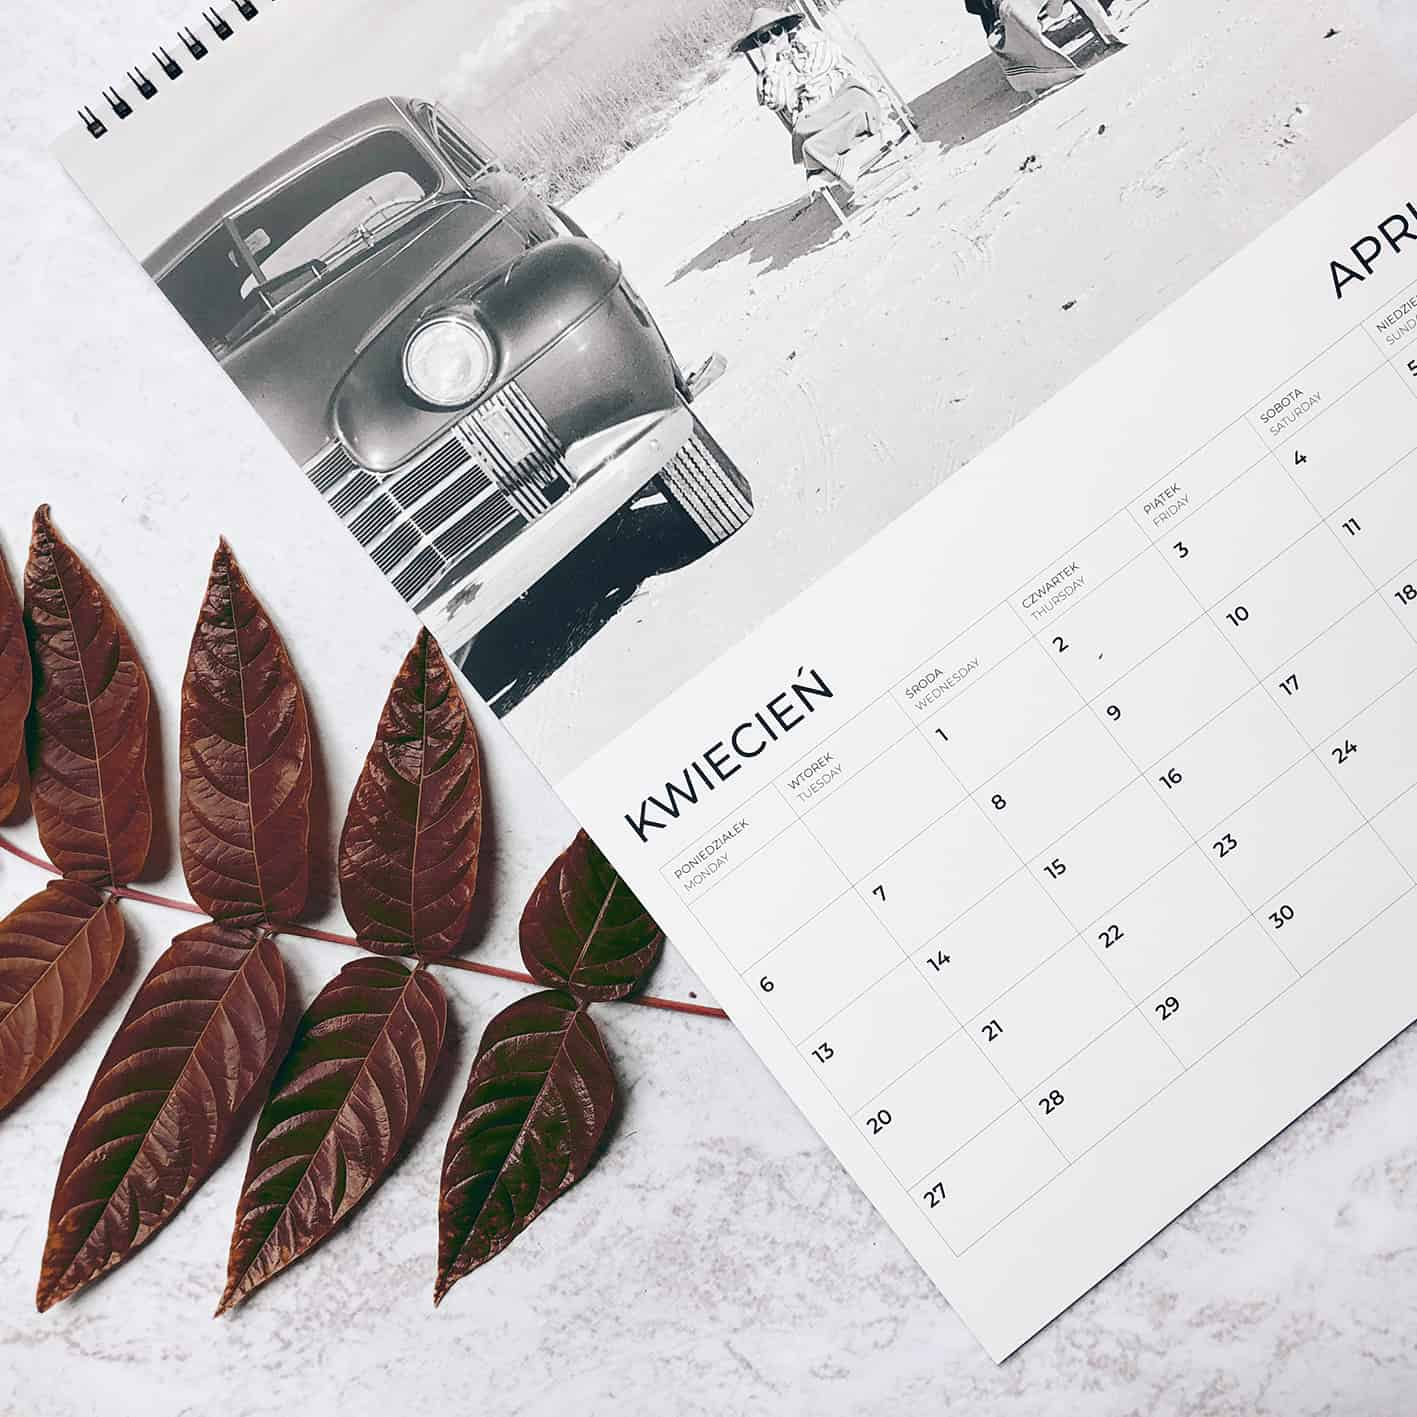 kalendarz-pomysl-na-prezent-1